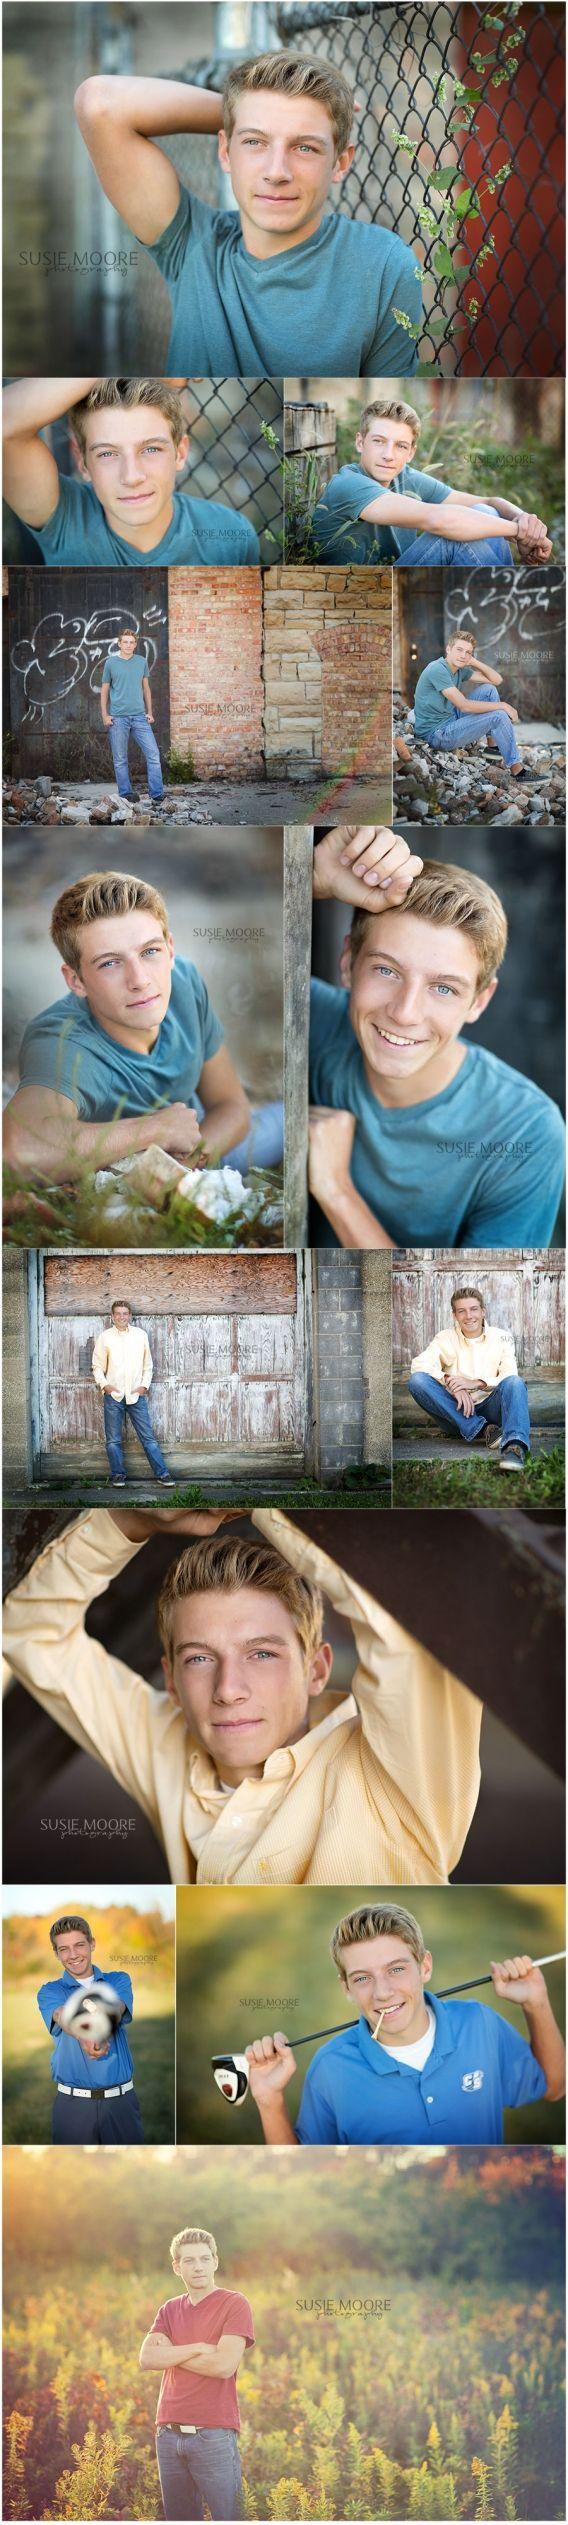 Luke   Carl Sandburg High School   IL Senior Photographer   Susie Moore Photography